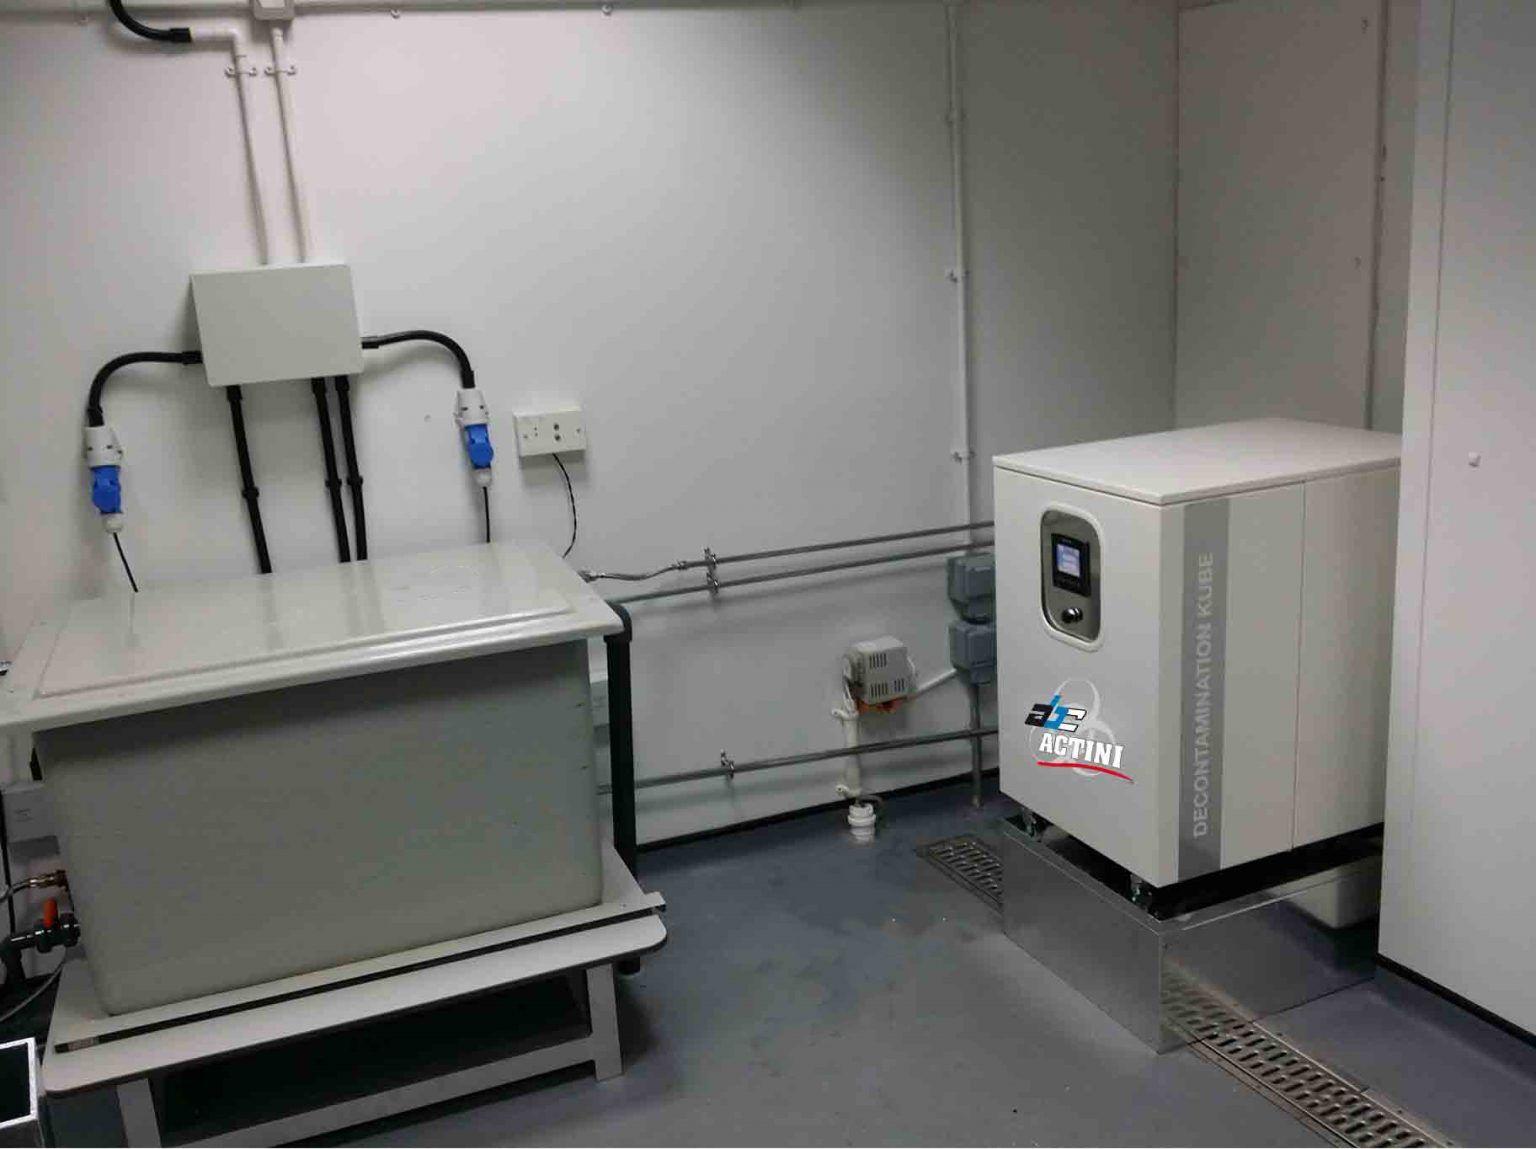 ABC Actini KUBE decontamination unit